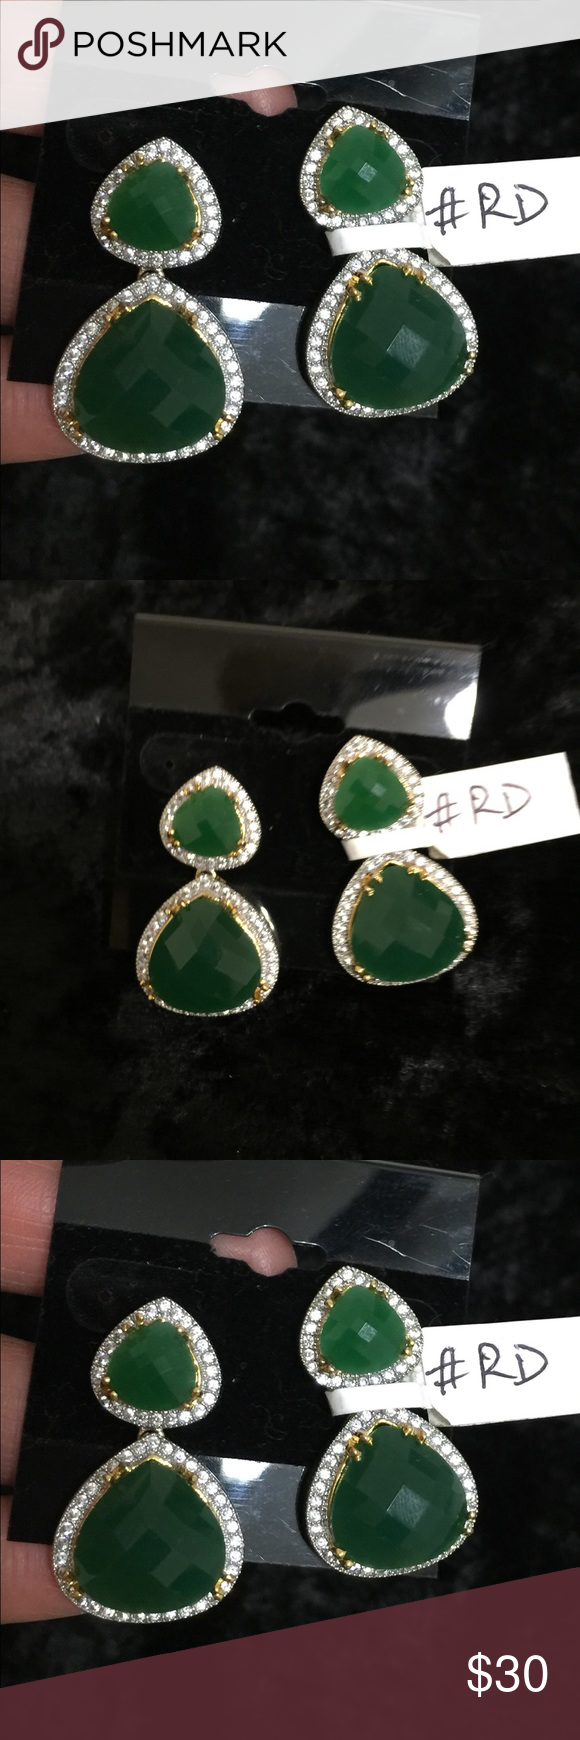 EARRINGS!! Beautiful green colored lab created stone DROP earrings ...